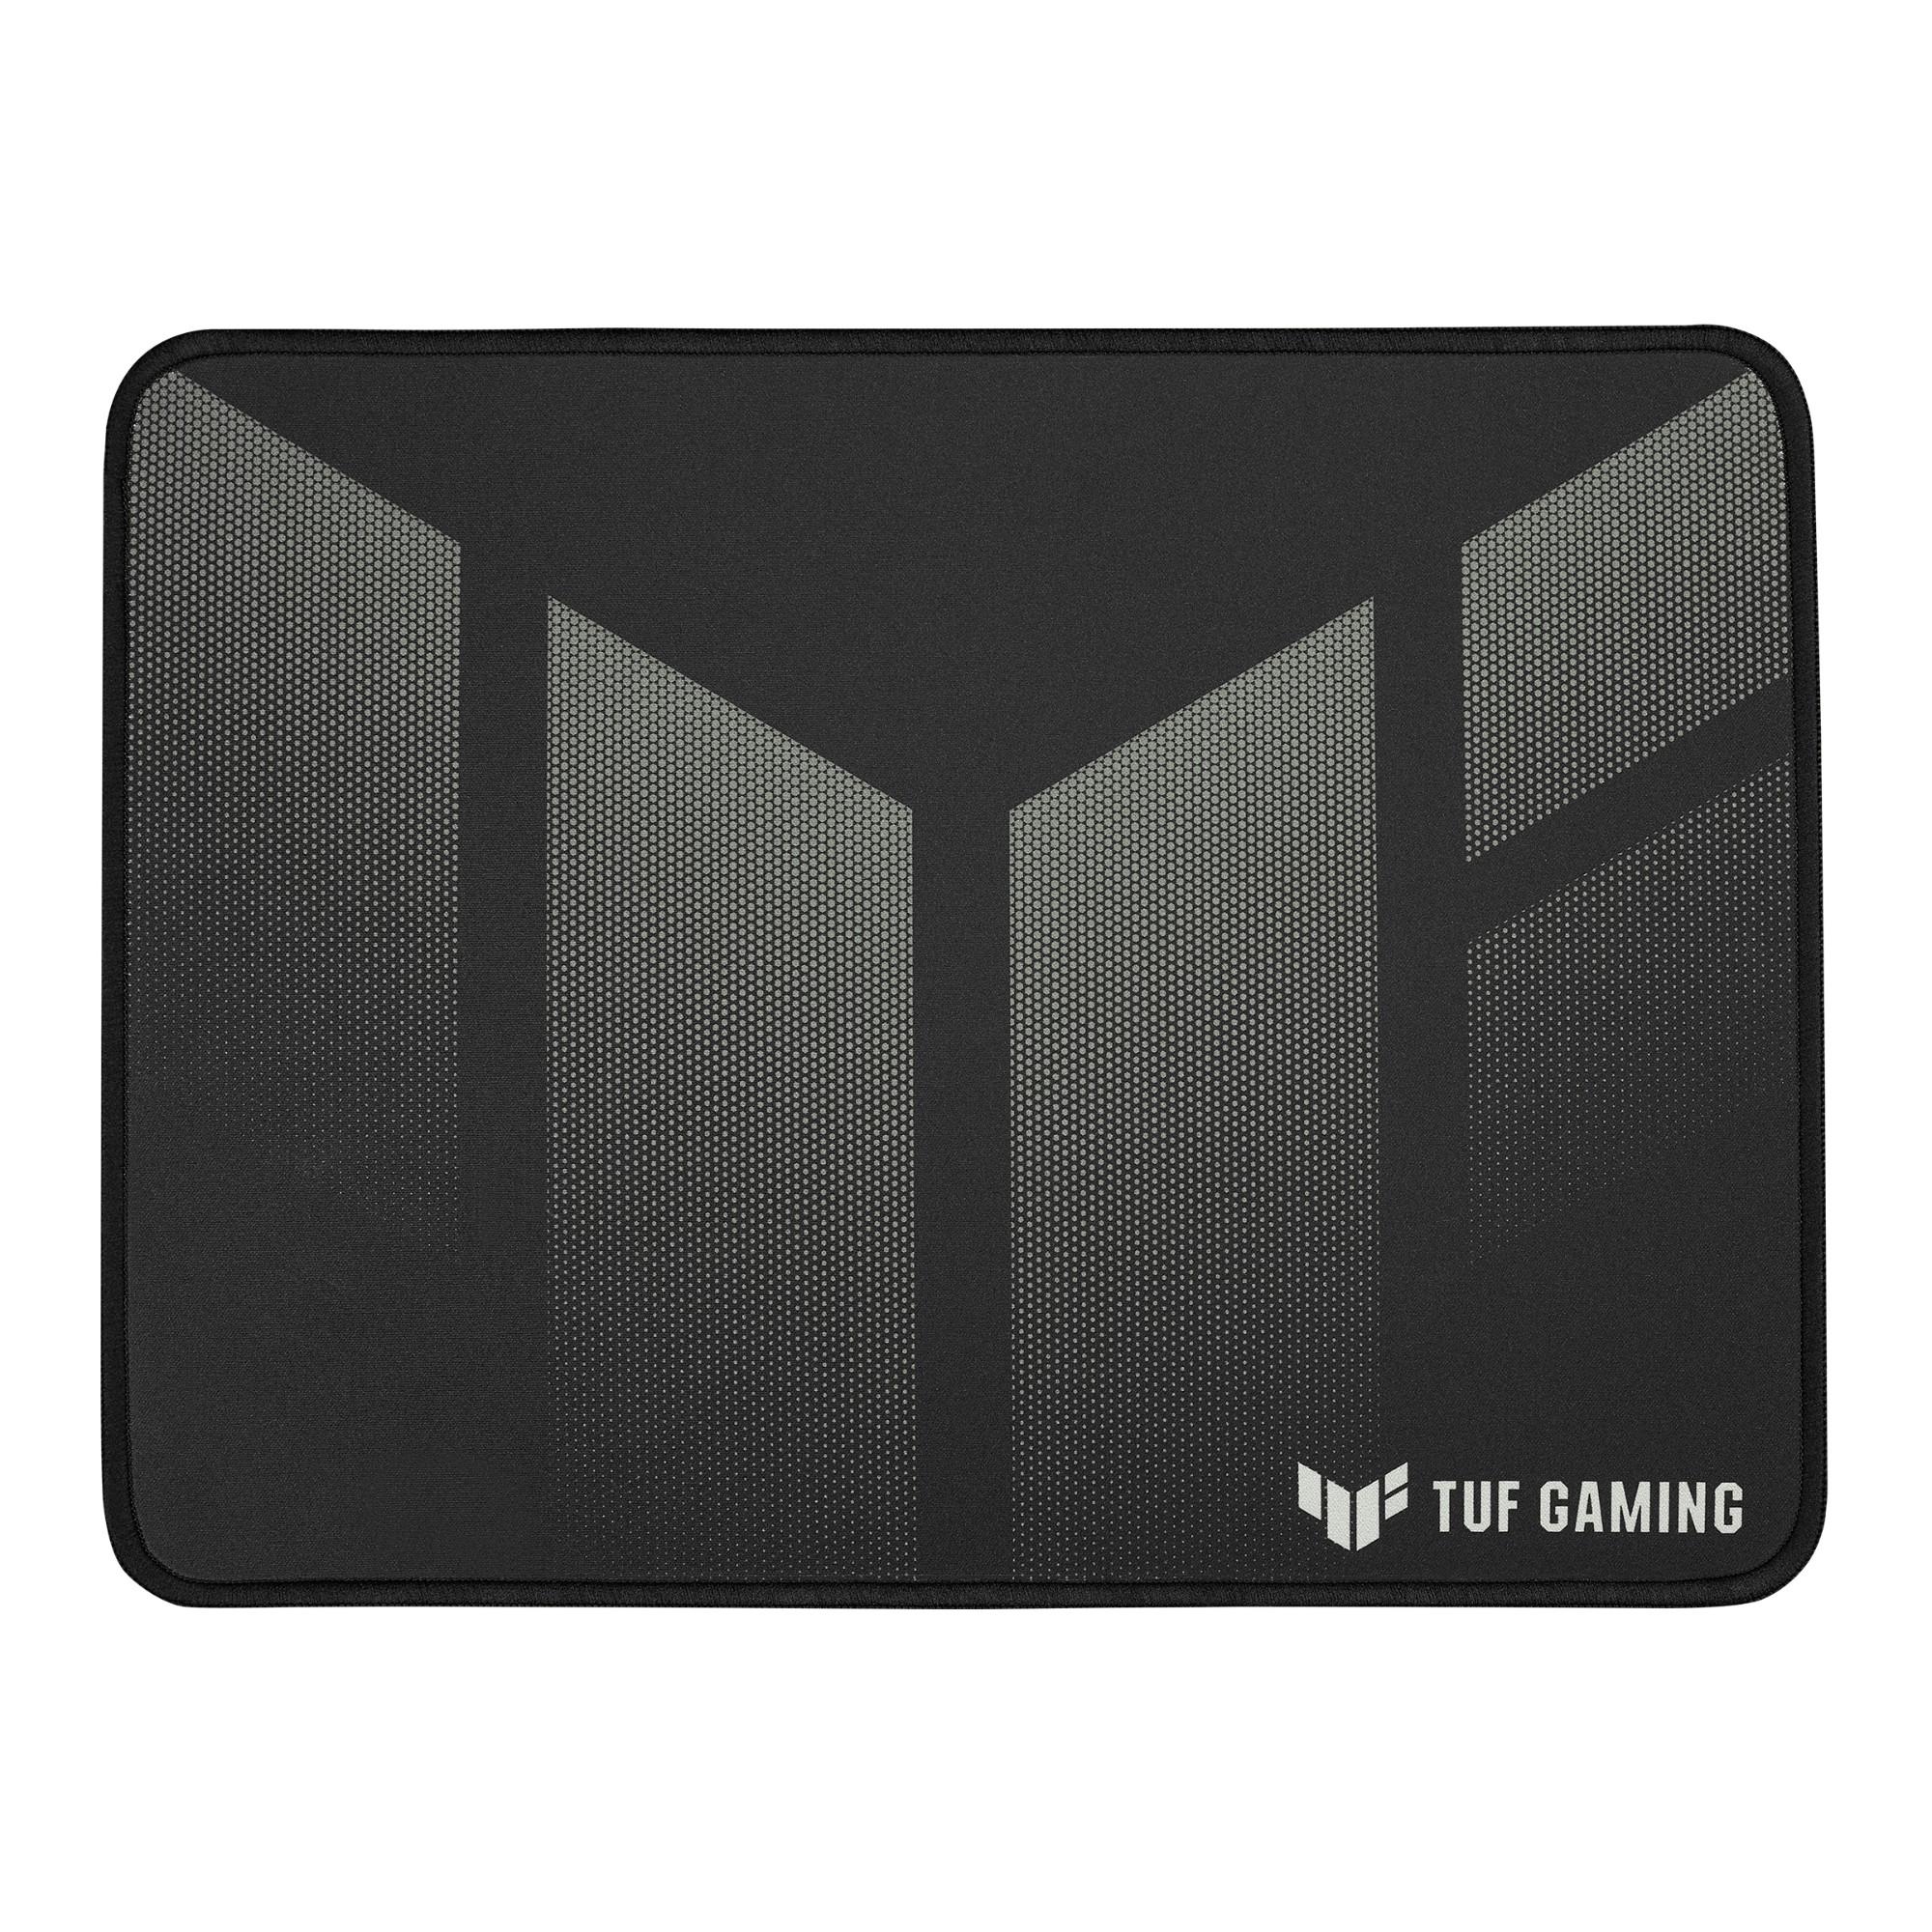 ASUS TUF P1 Gaming Gaming mouse pad Black, Grey